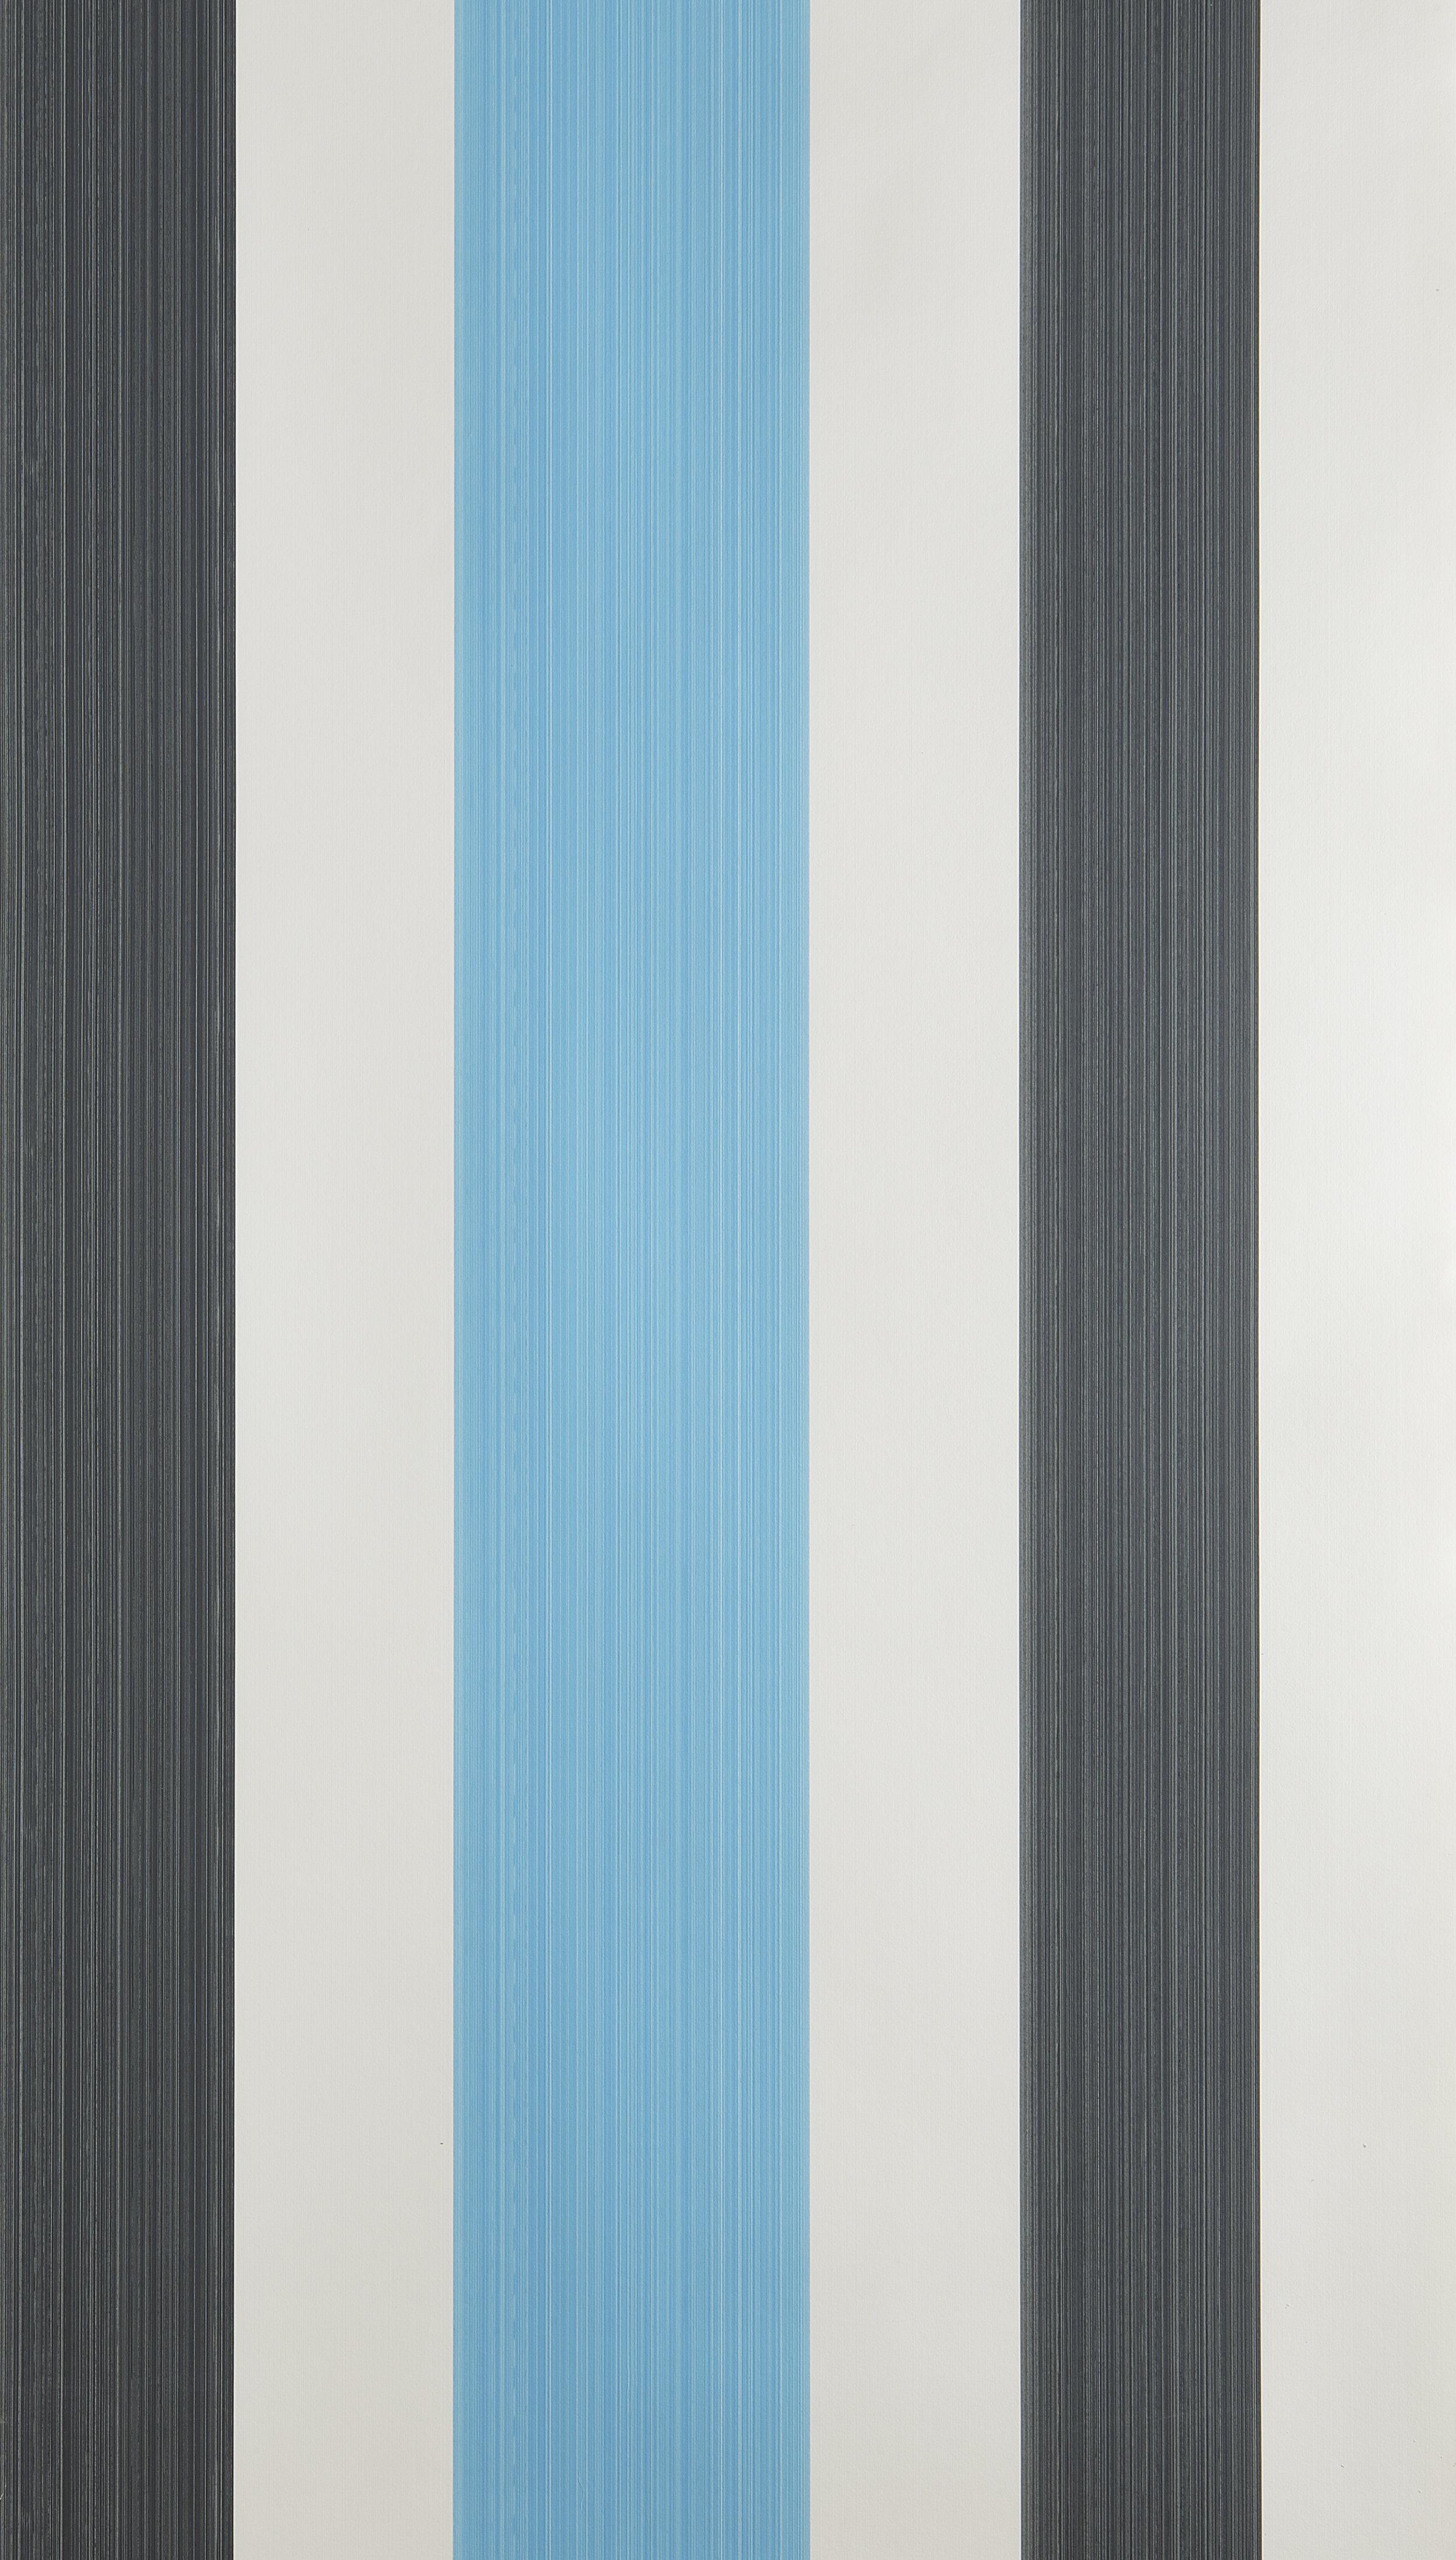 Chromatic Stripe 4205 $195 Per Roll  Order Now